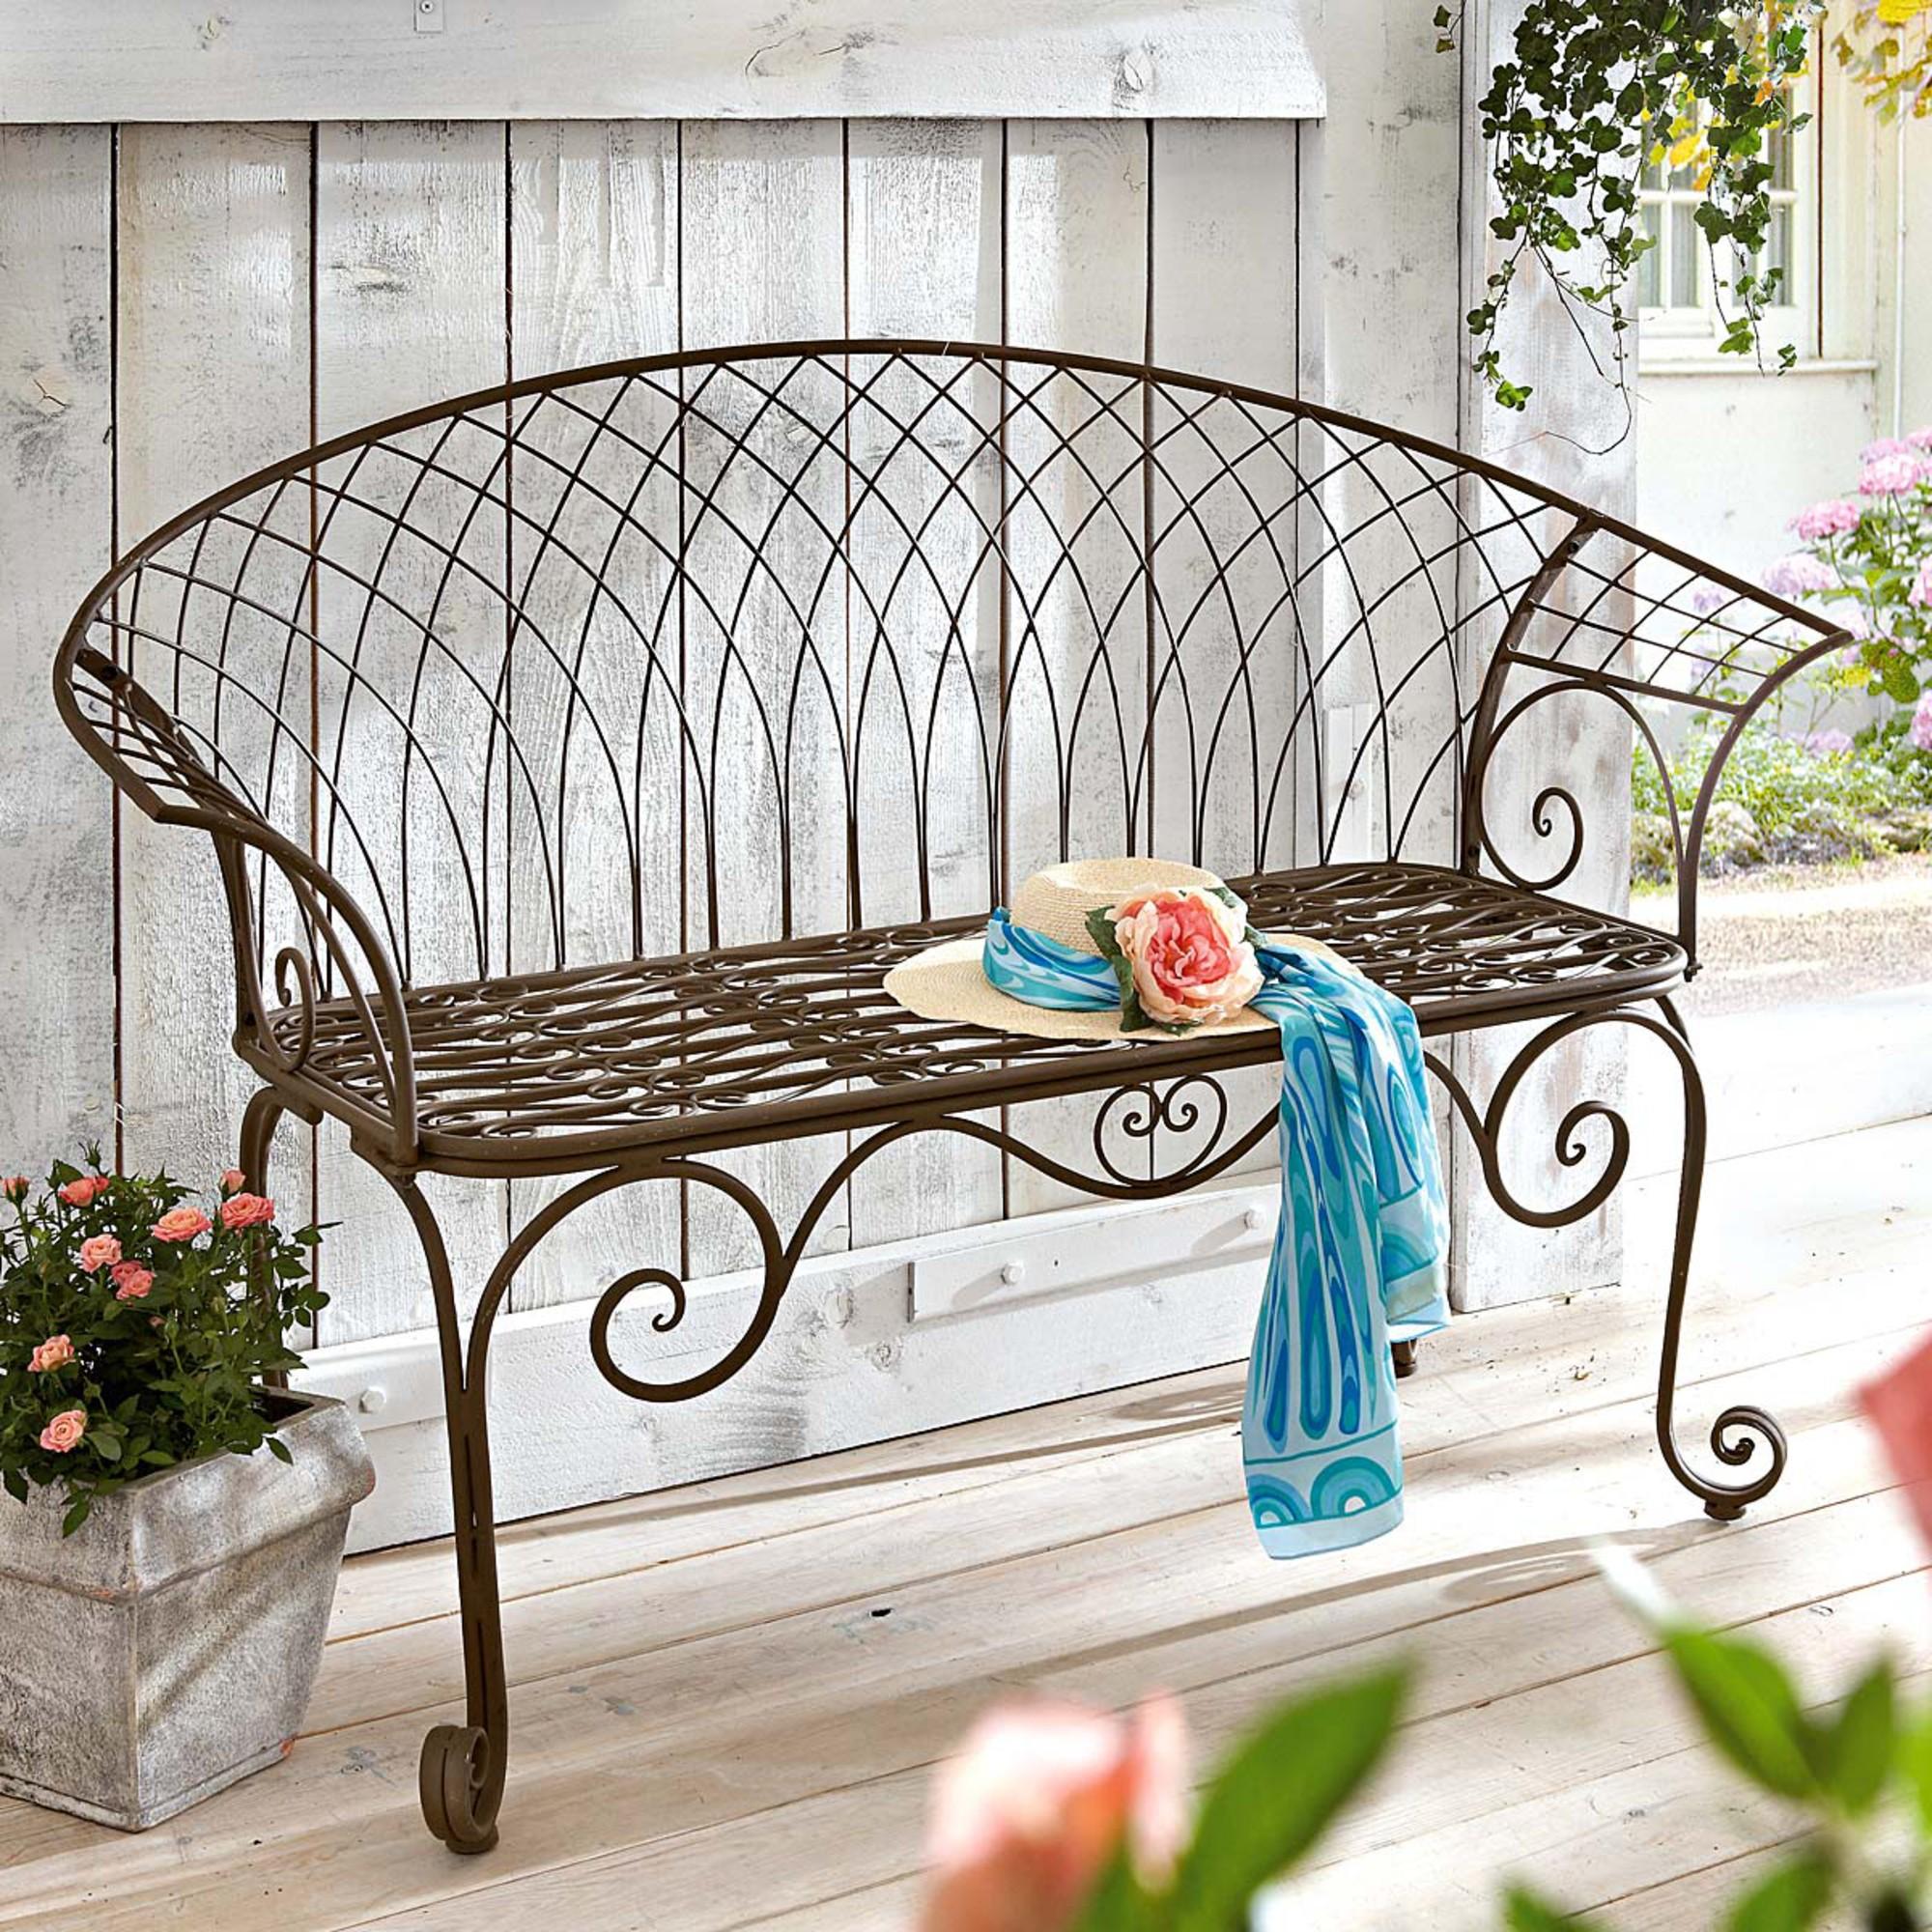 Gartenbank Metall Aldi 2 Sitzer